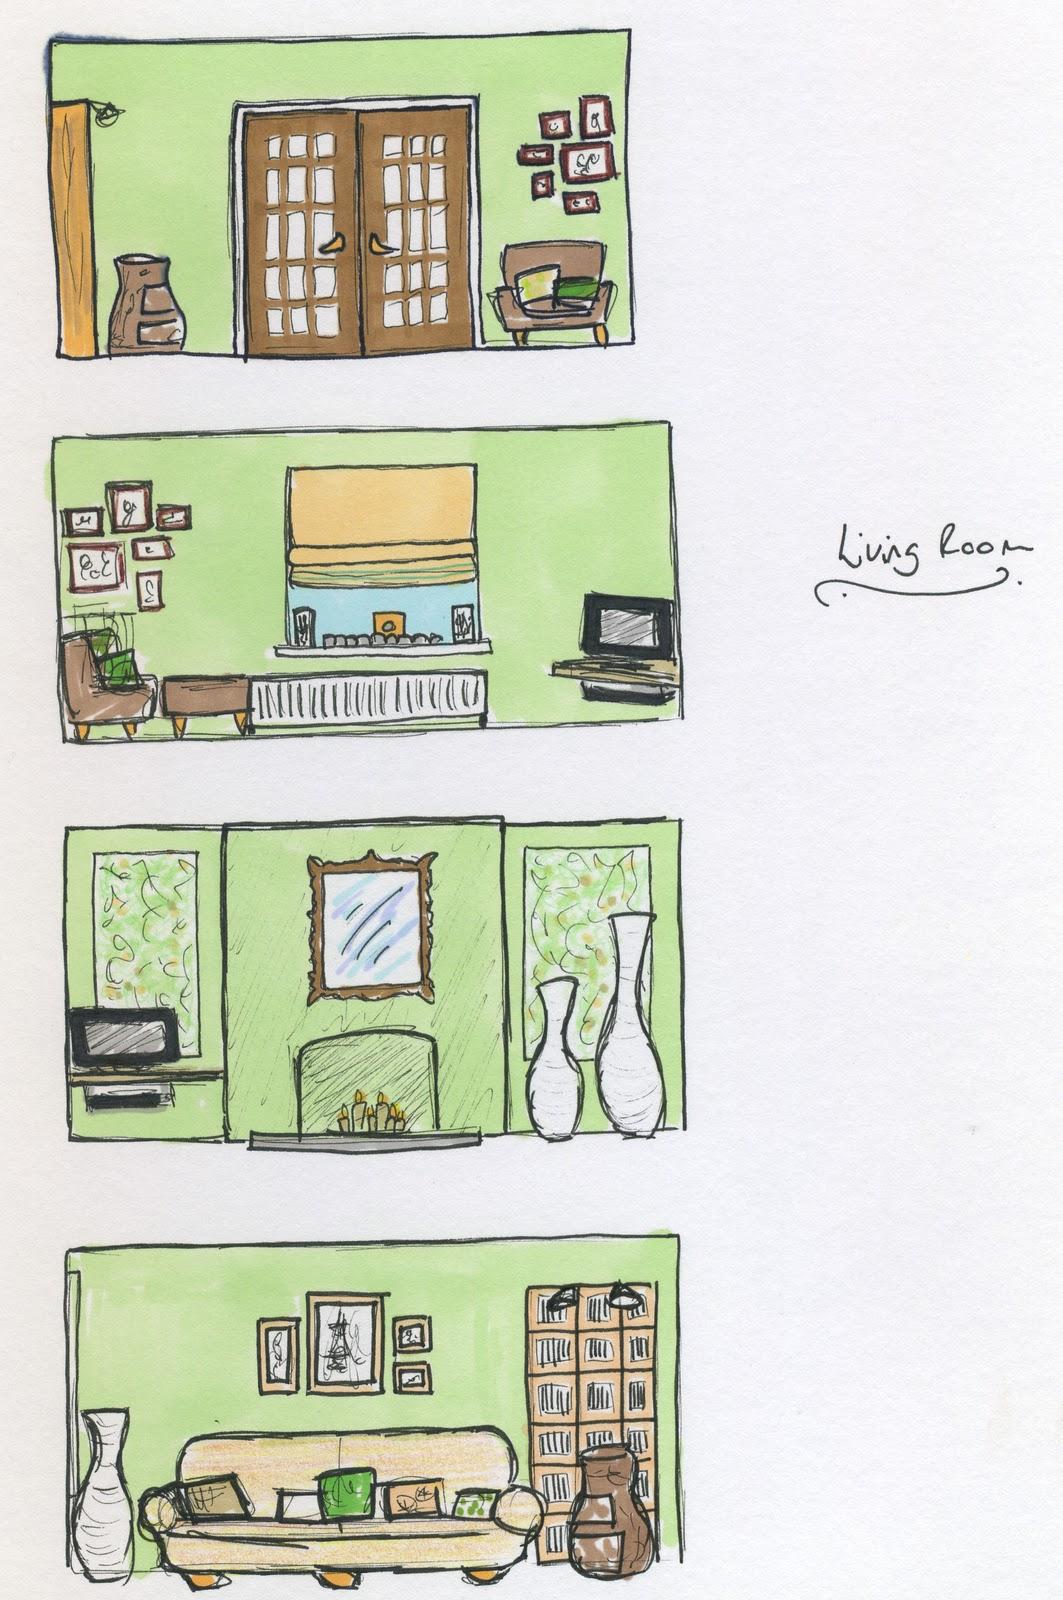 http://4.bp.blogspot.com/-opCgbo6GLmU/TrLWbdmfB8I/AAAAAAAAANI/OkXQ7KDALI0/s1600/colour+sketch+2.jpg